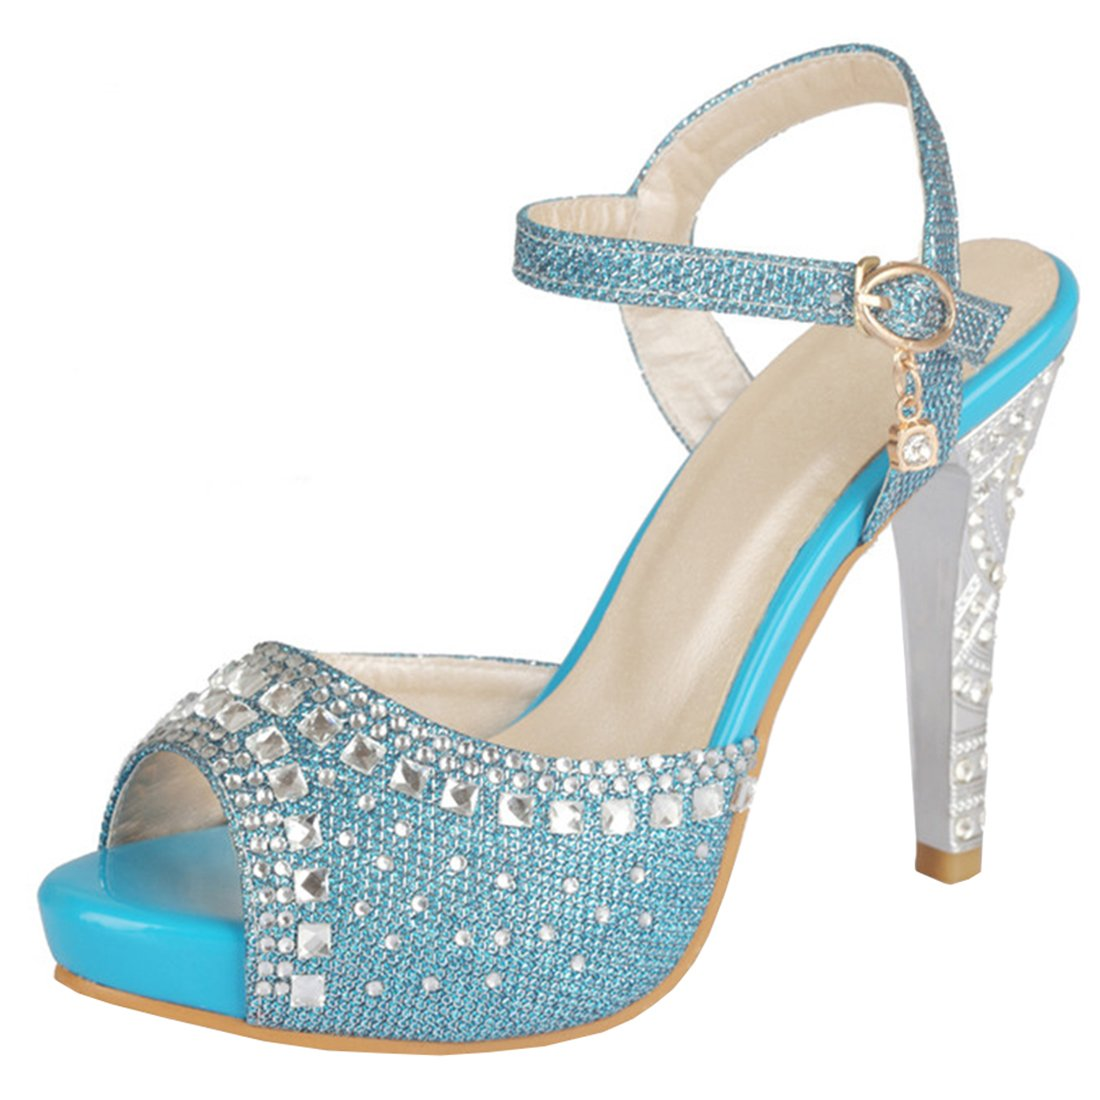 Atyche Bride Femme Bride Cheville Femme Bleu Bleu 40b28be - jessicalock.space